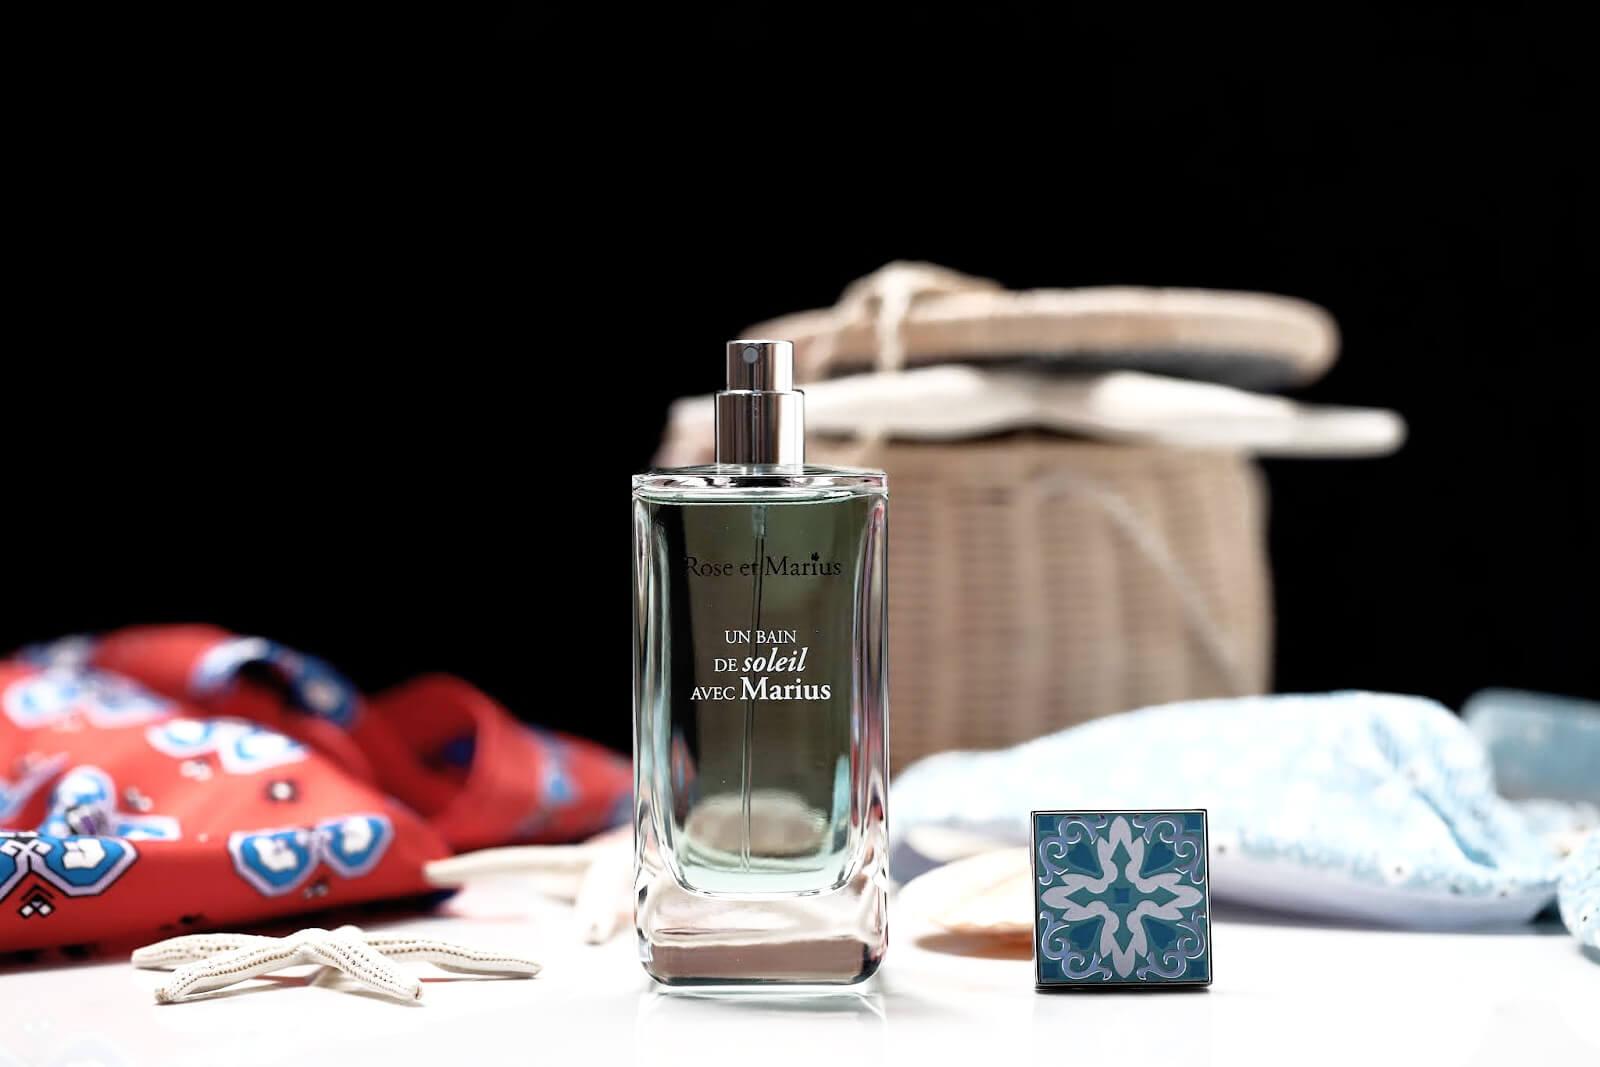 Rose et Marius Un Bain De Soleil Parfum avis